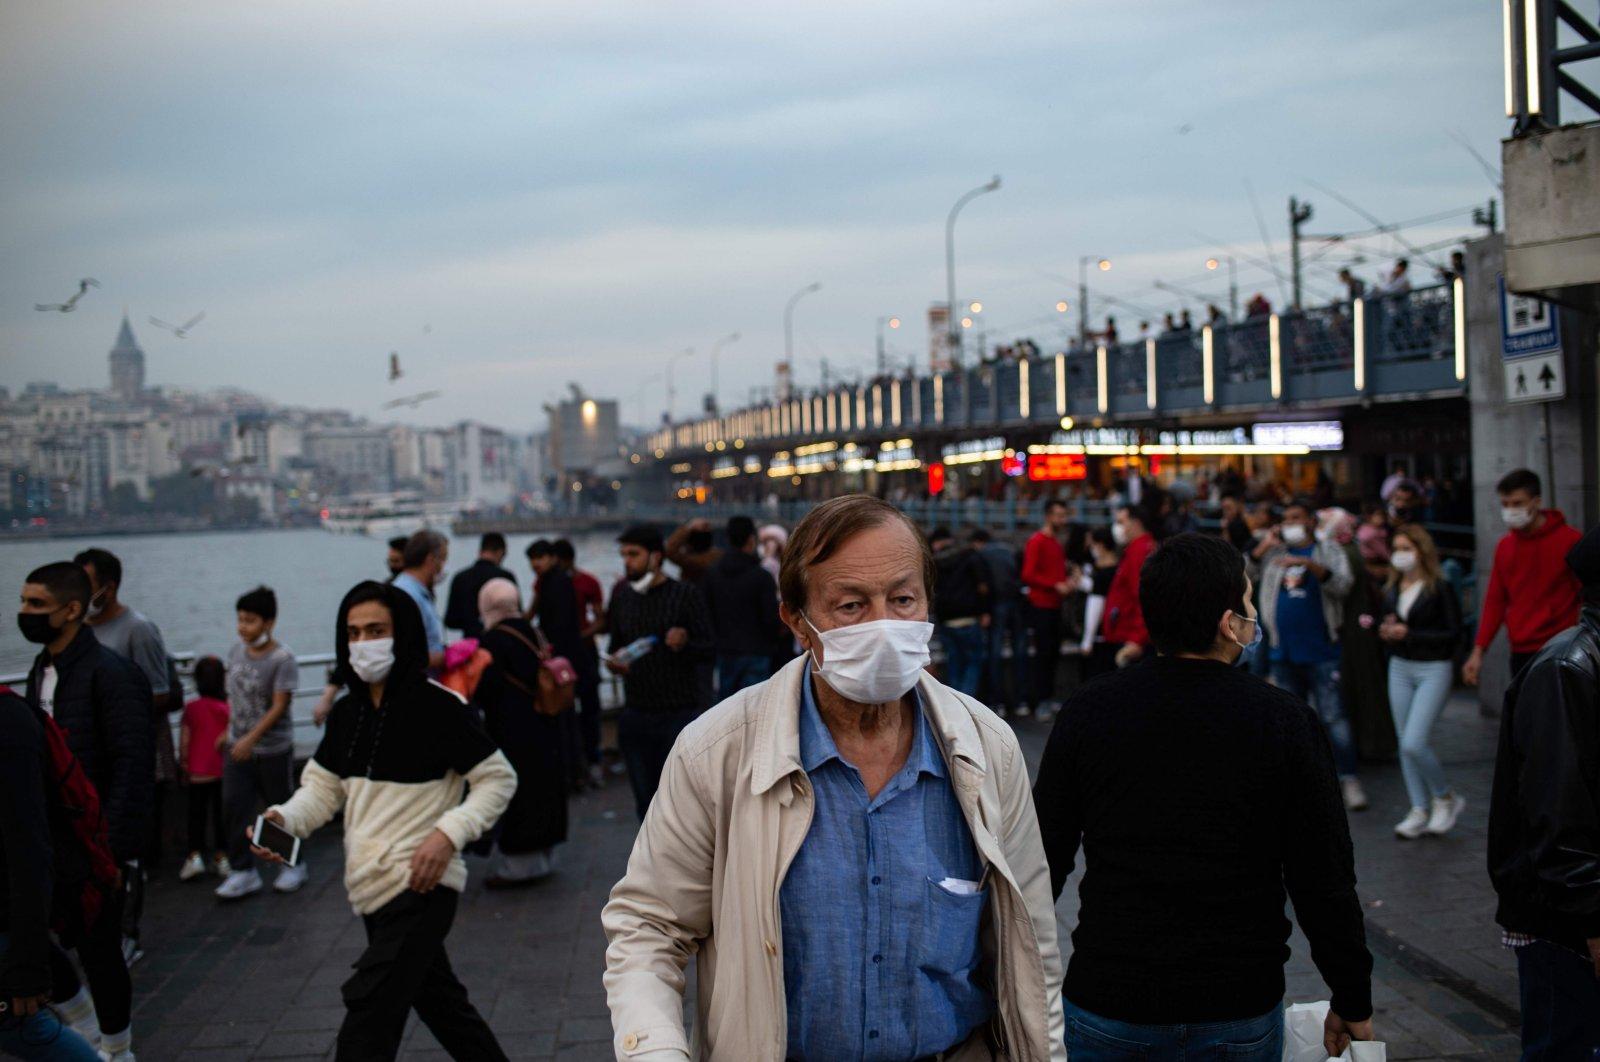 A man, wearing a face mask, walks near the Galata bridge, in Istanbul, Turkey, Oct. 25, 2020. (AFP Photo)